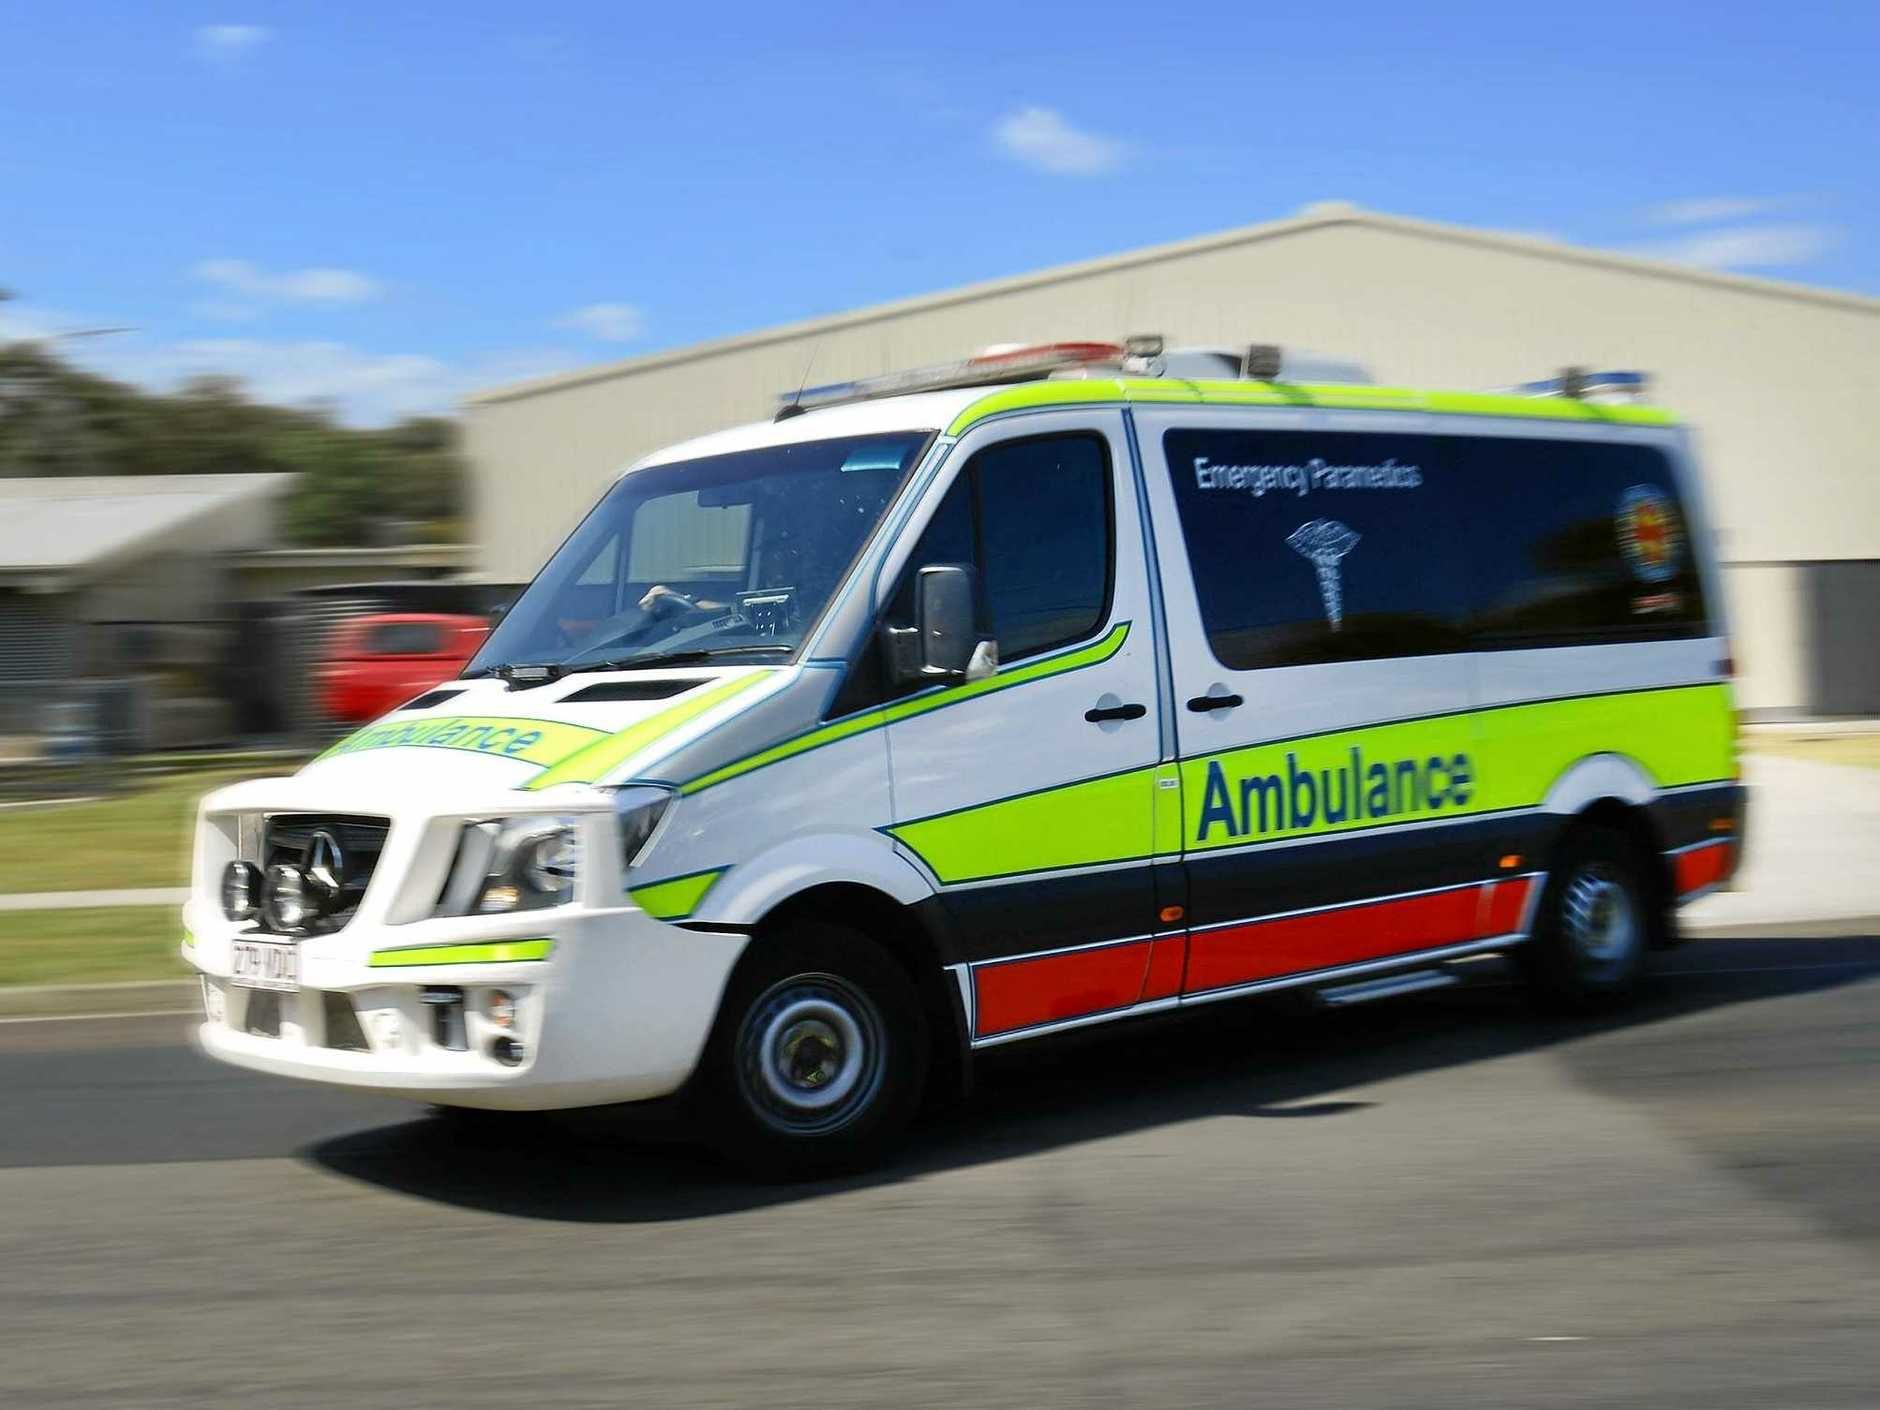 A man has died following a single-vehicle crash.